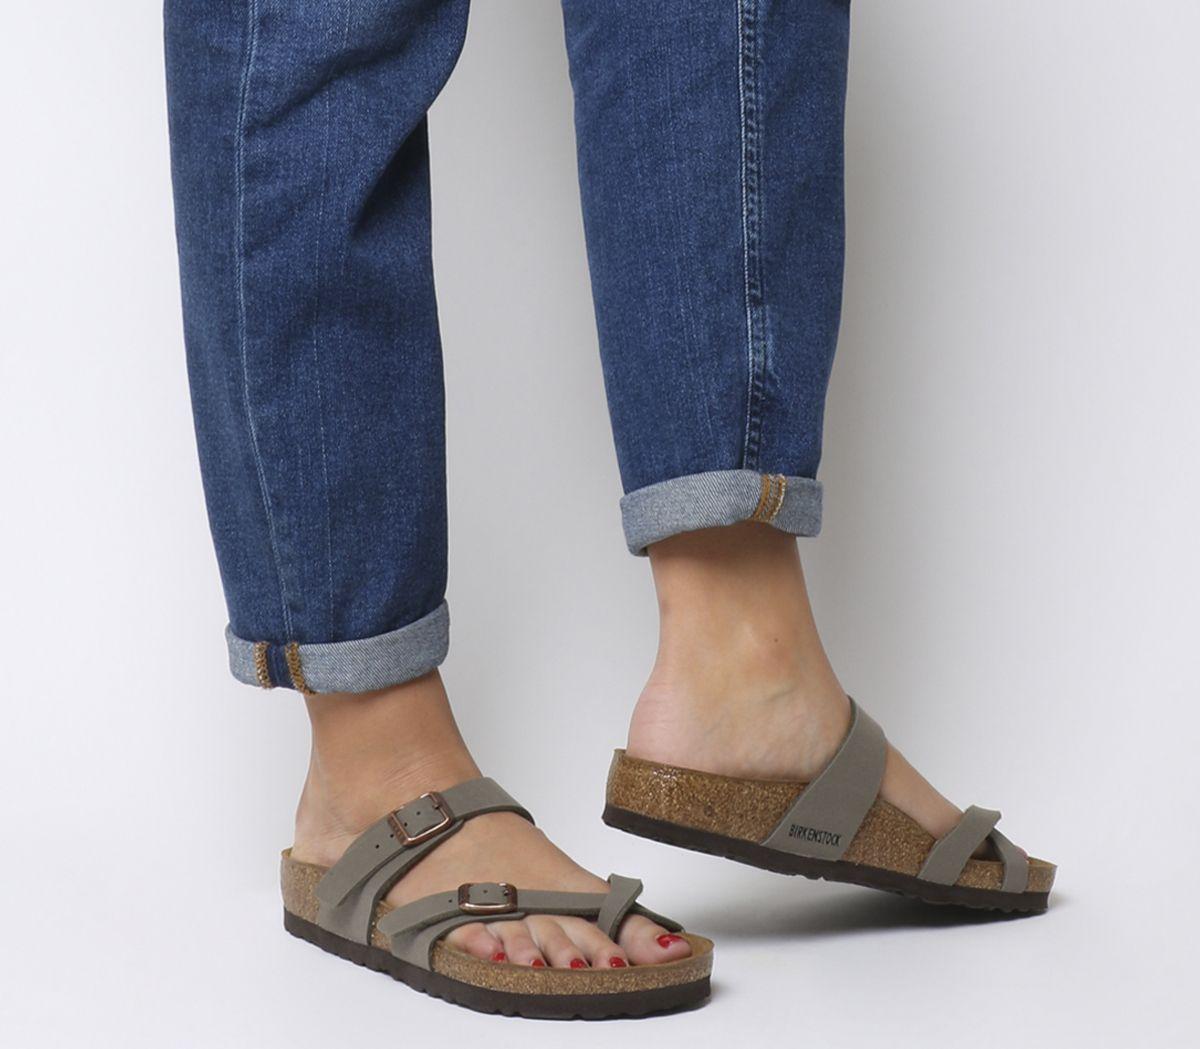 4054e8b3d Birkenstock Mayari Cross Strap Sandals Stone - Sandals